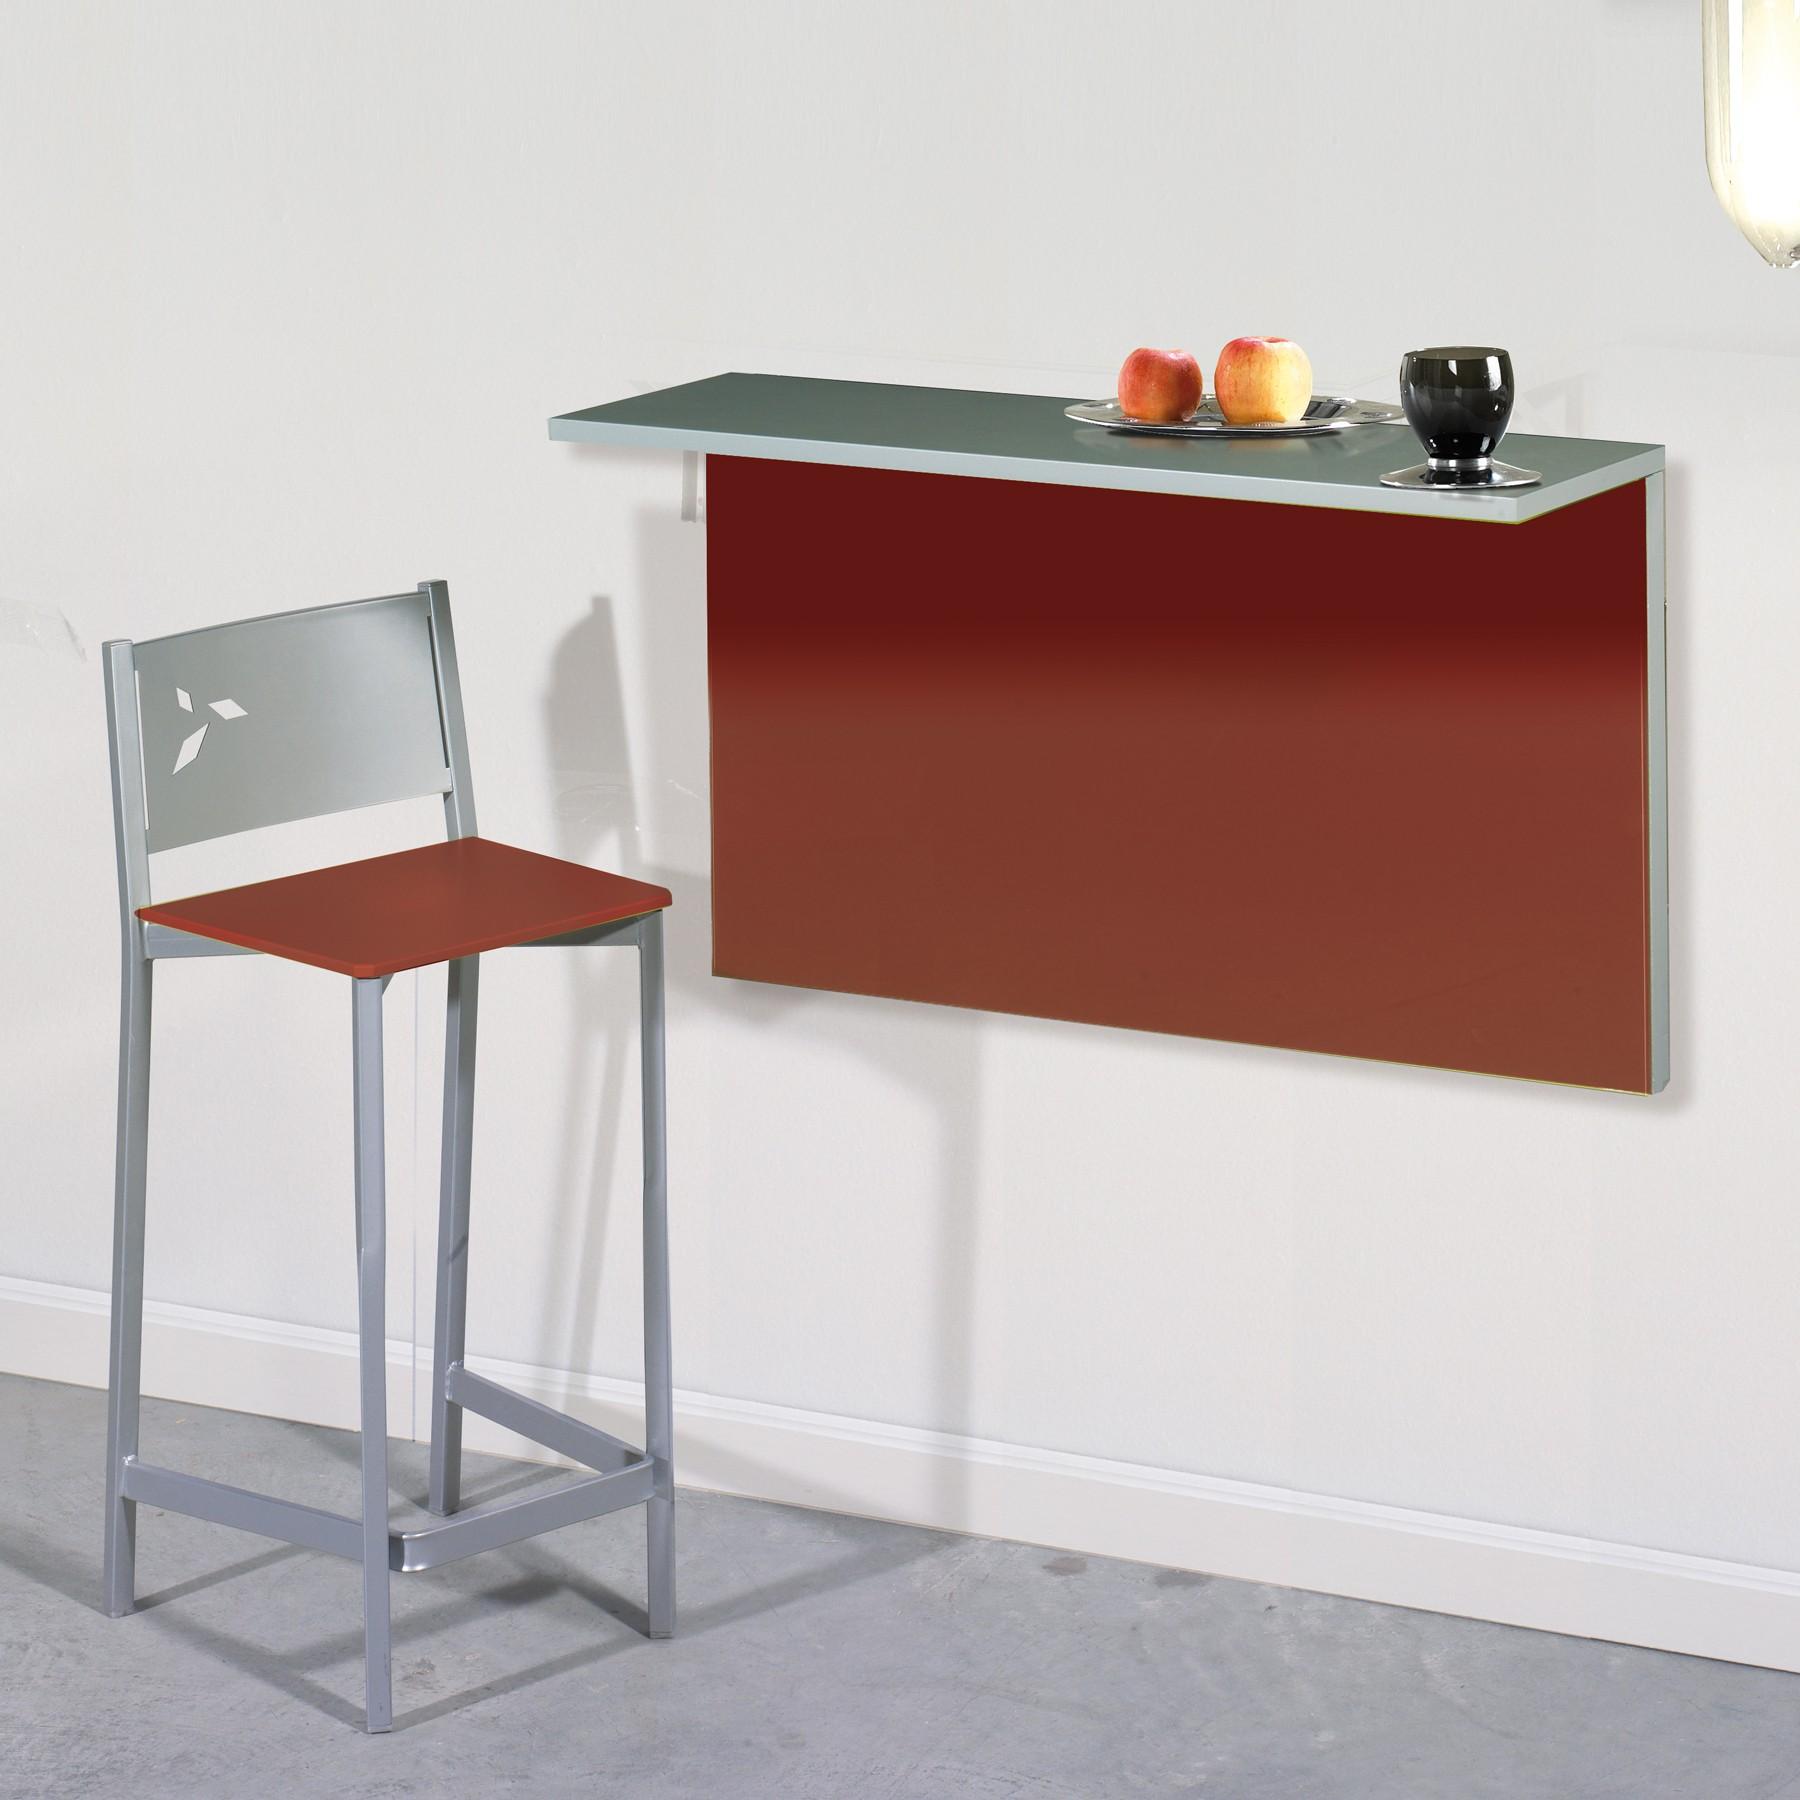 Pack ahorro en mesa de cocina de pared con dos taburetes modelo DKG.